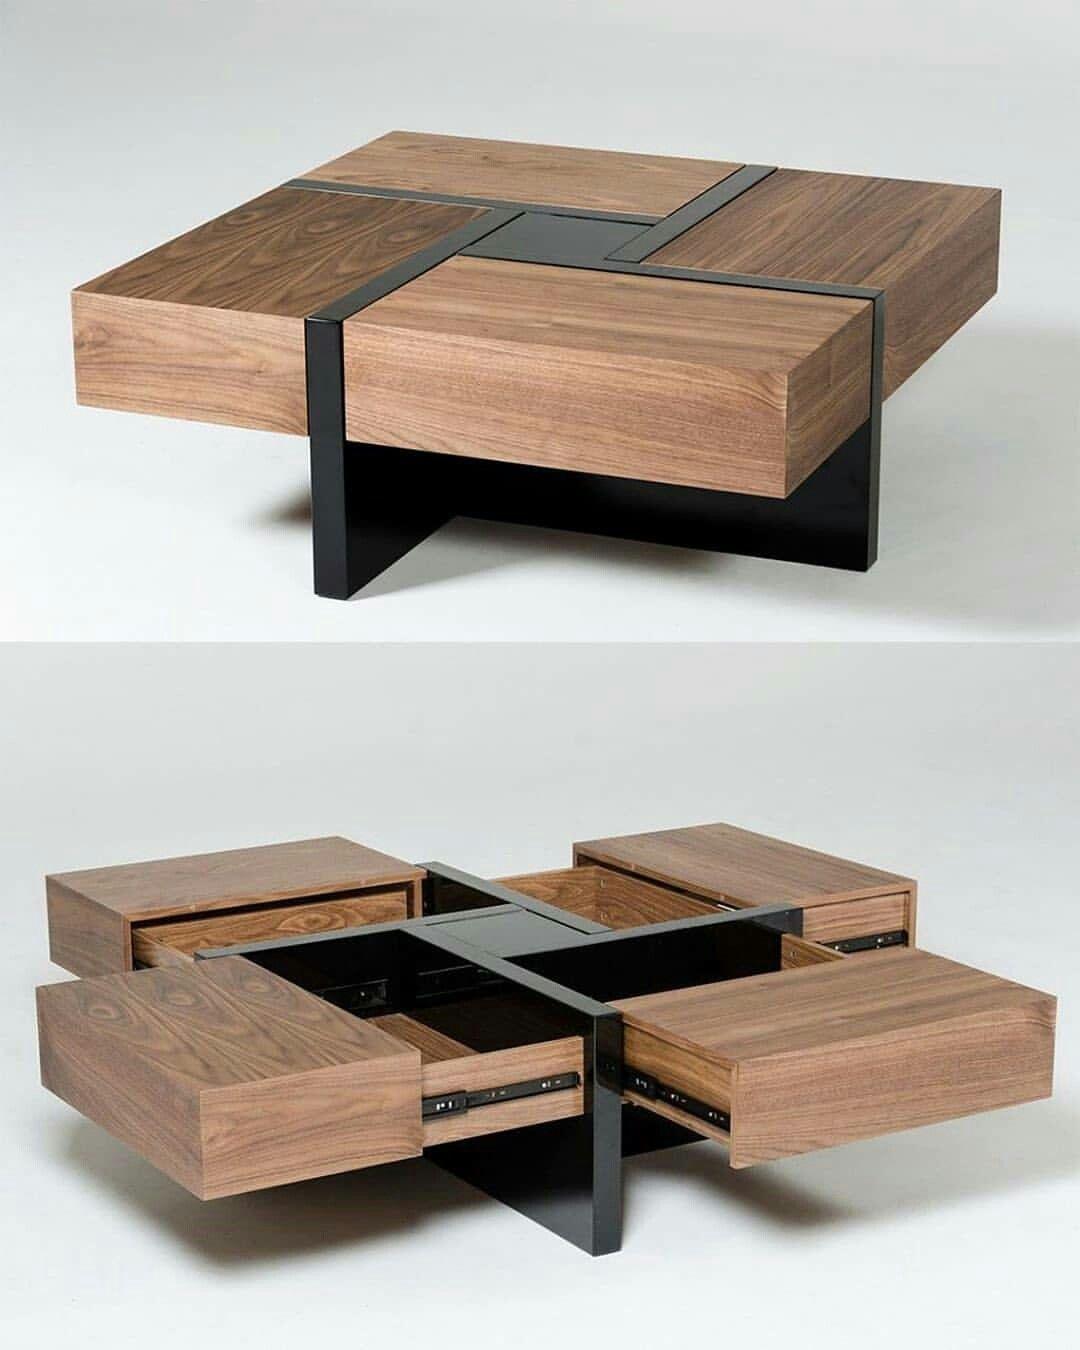 Pin By Kudiratsunmonu On Deco Tea Table Design Modern Square Coffee Table Coffee Table Design Modern [ 1350 x 1080 Pixel ]